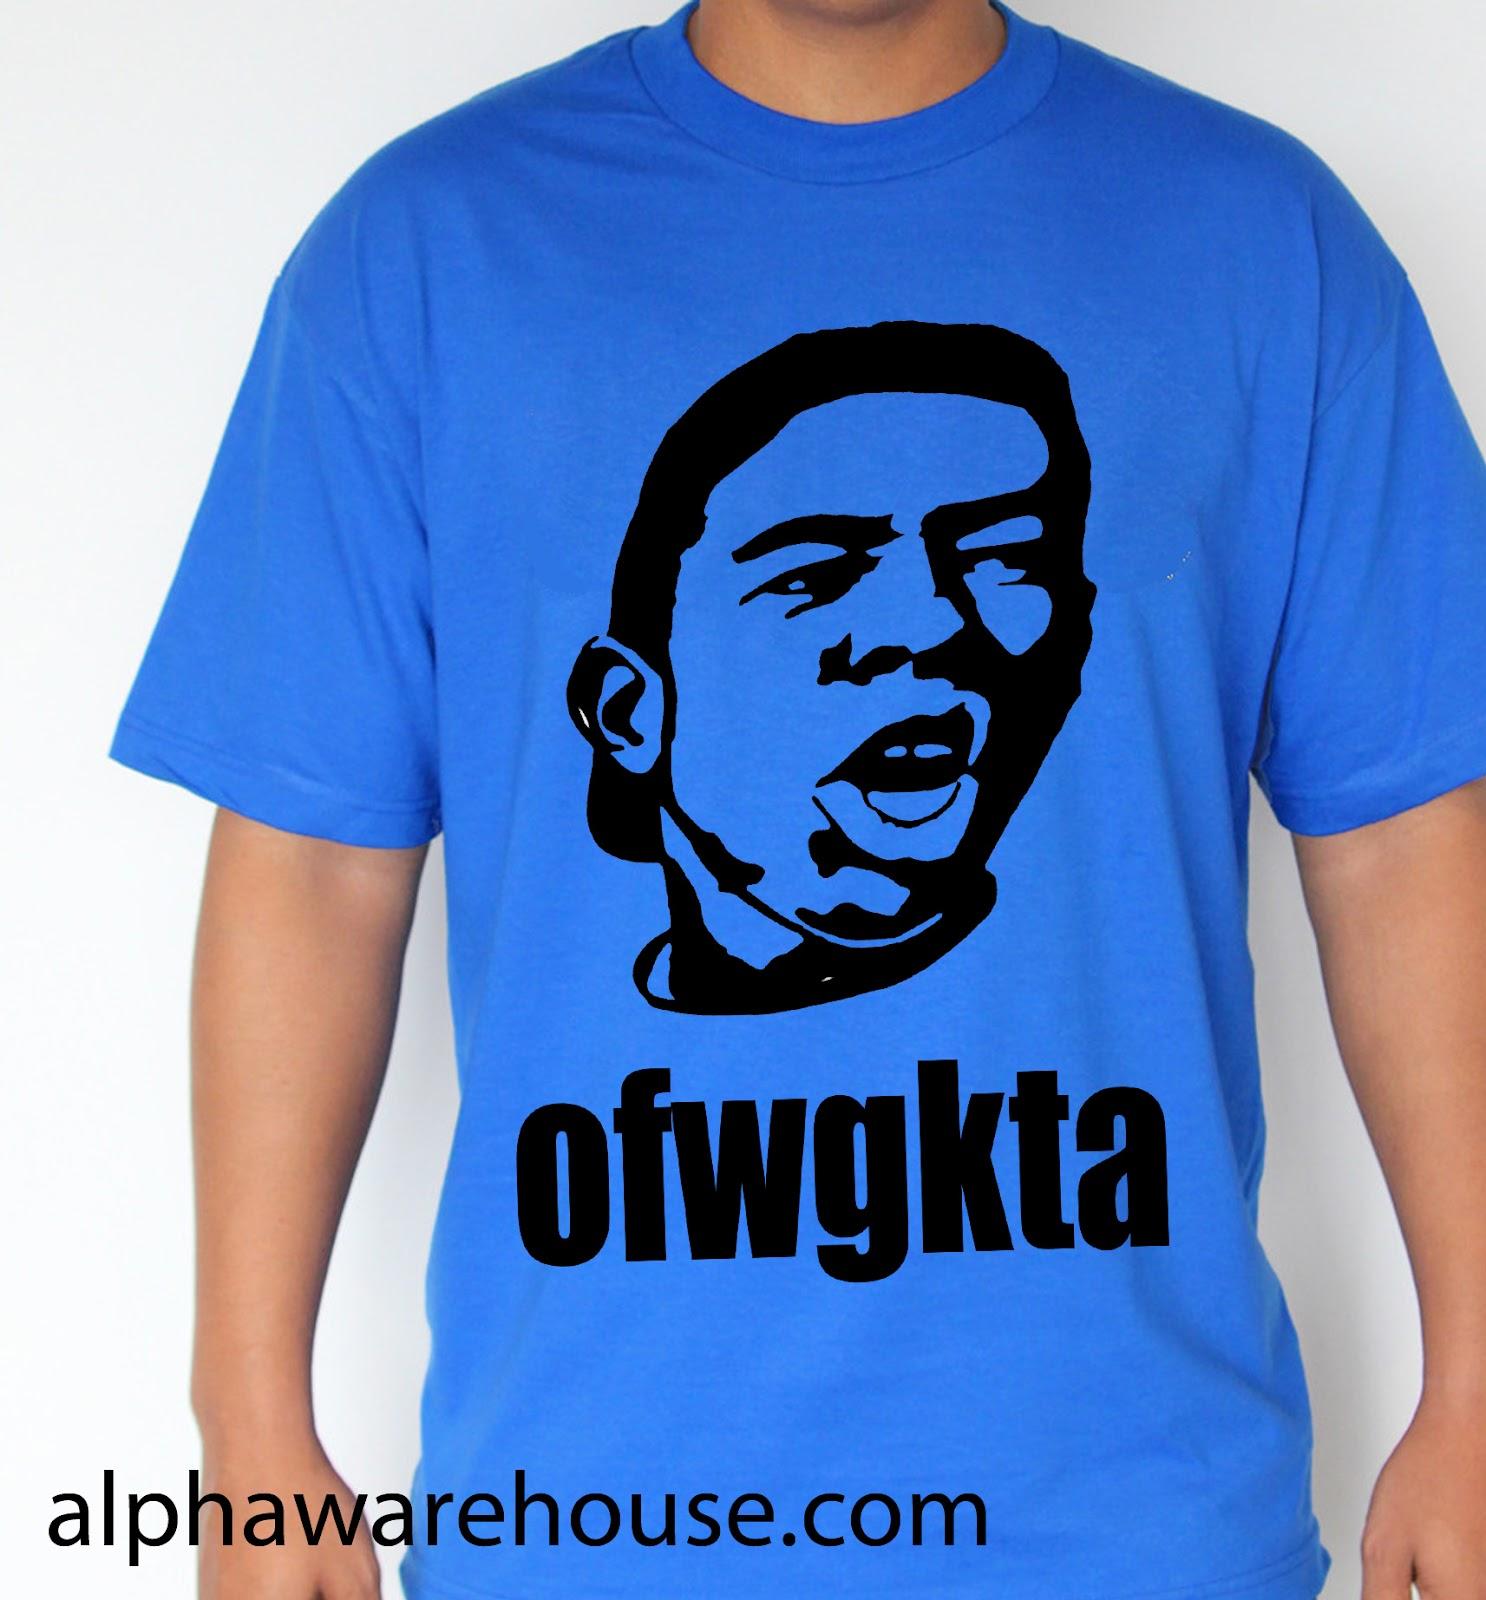 fa2fe0129067 ... Odd Future Golf Wang Wolf Gang T Shirt COTTON. Tyler the creator  inspired design